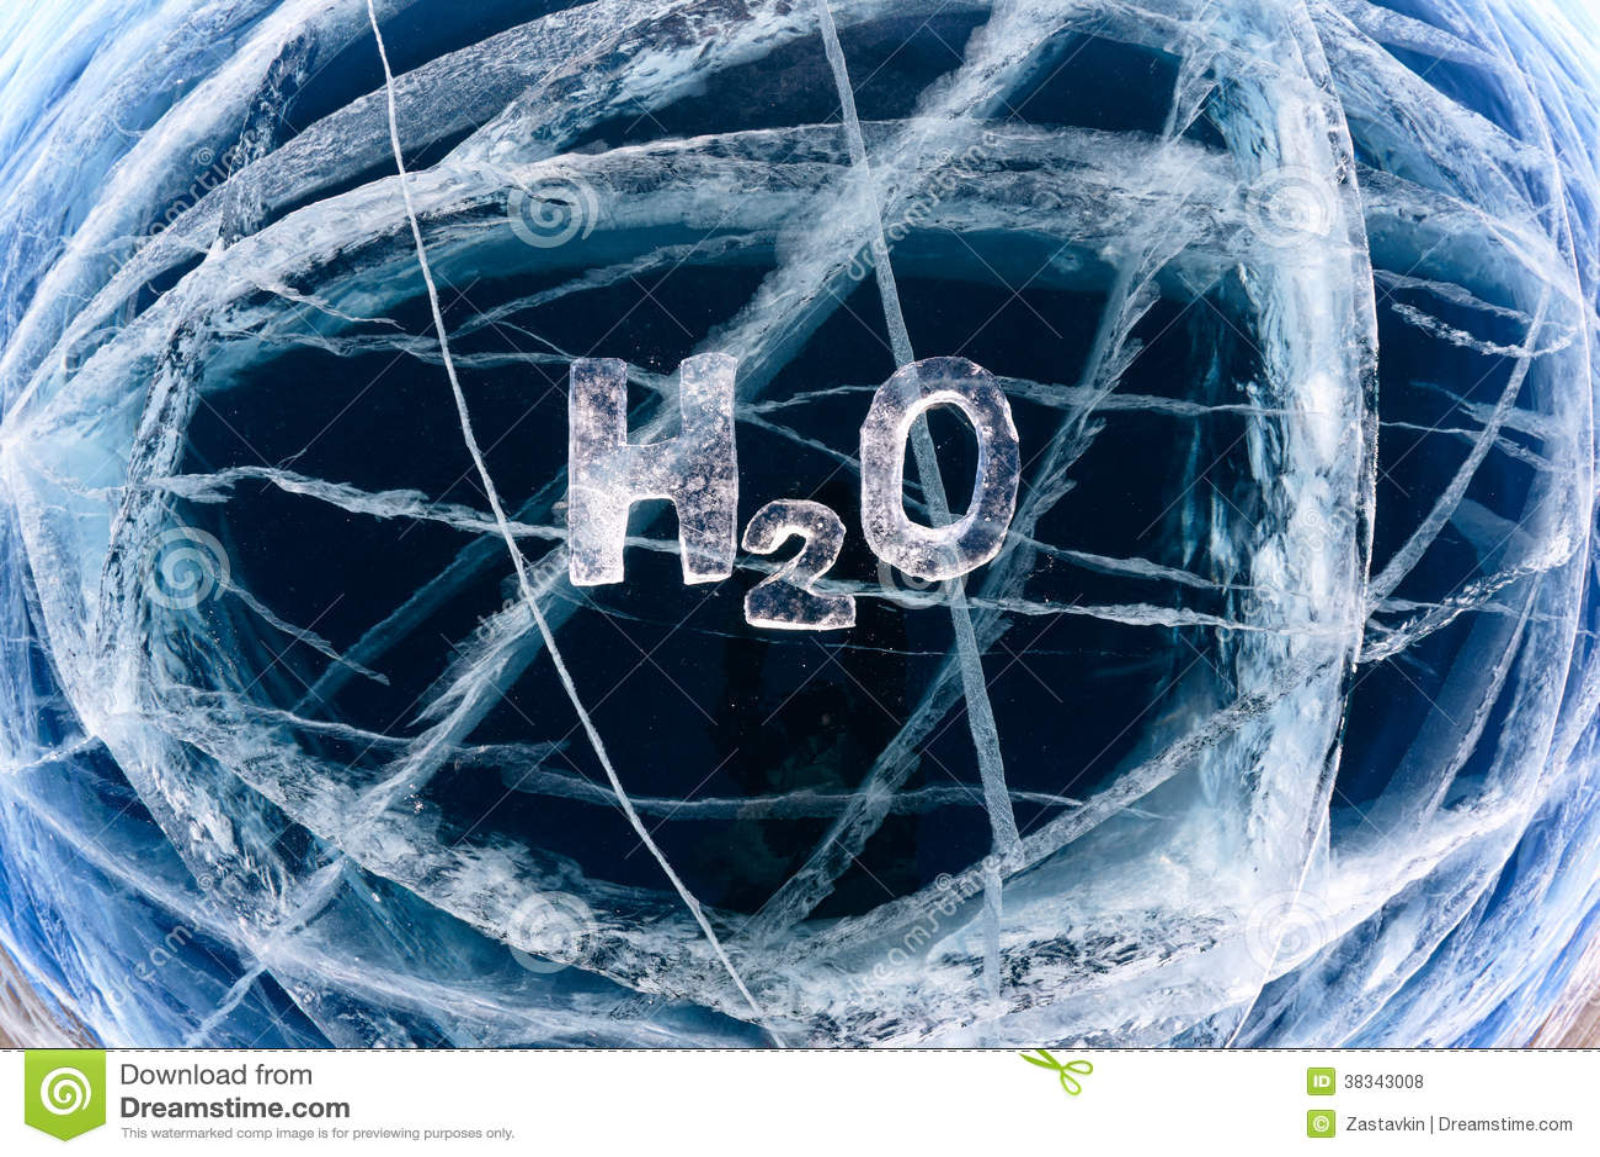 1g水中有个H2O如题.摩尔过程、、质量钱表情包还6、图片